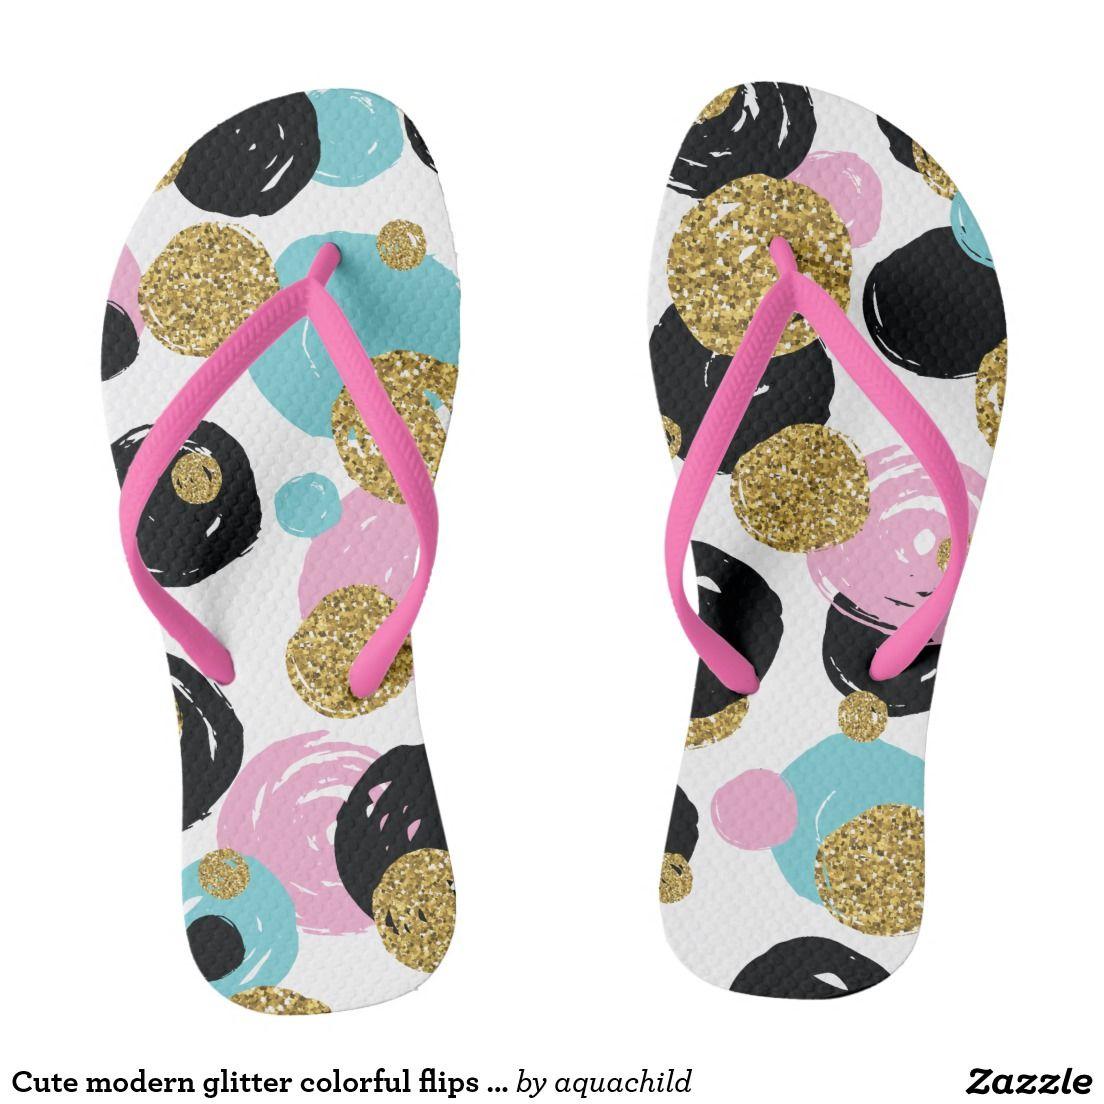 Cute modern glitter colorful flips flops flip flops